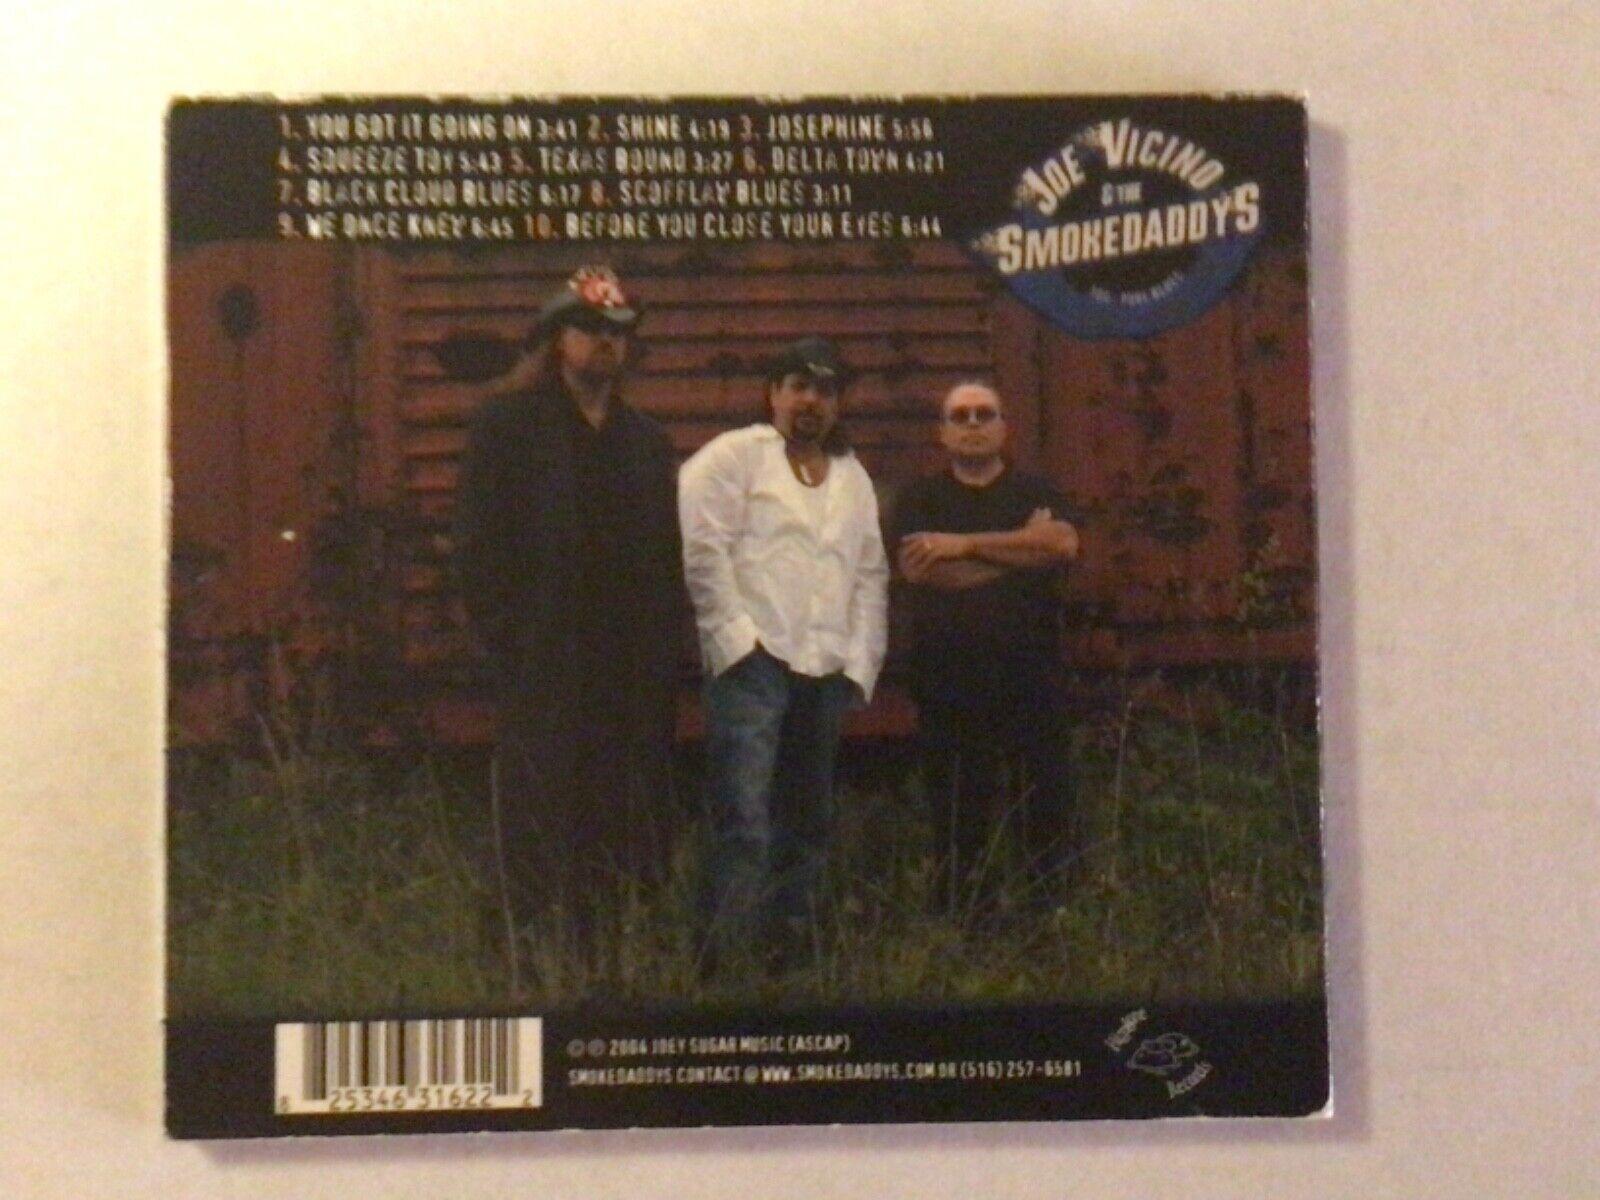 JOE VICINO THE SMOKEDADDYS CD - SHINE - KERRY KEARNEY - 100 PURE BLUES - $7.99